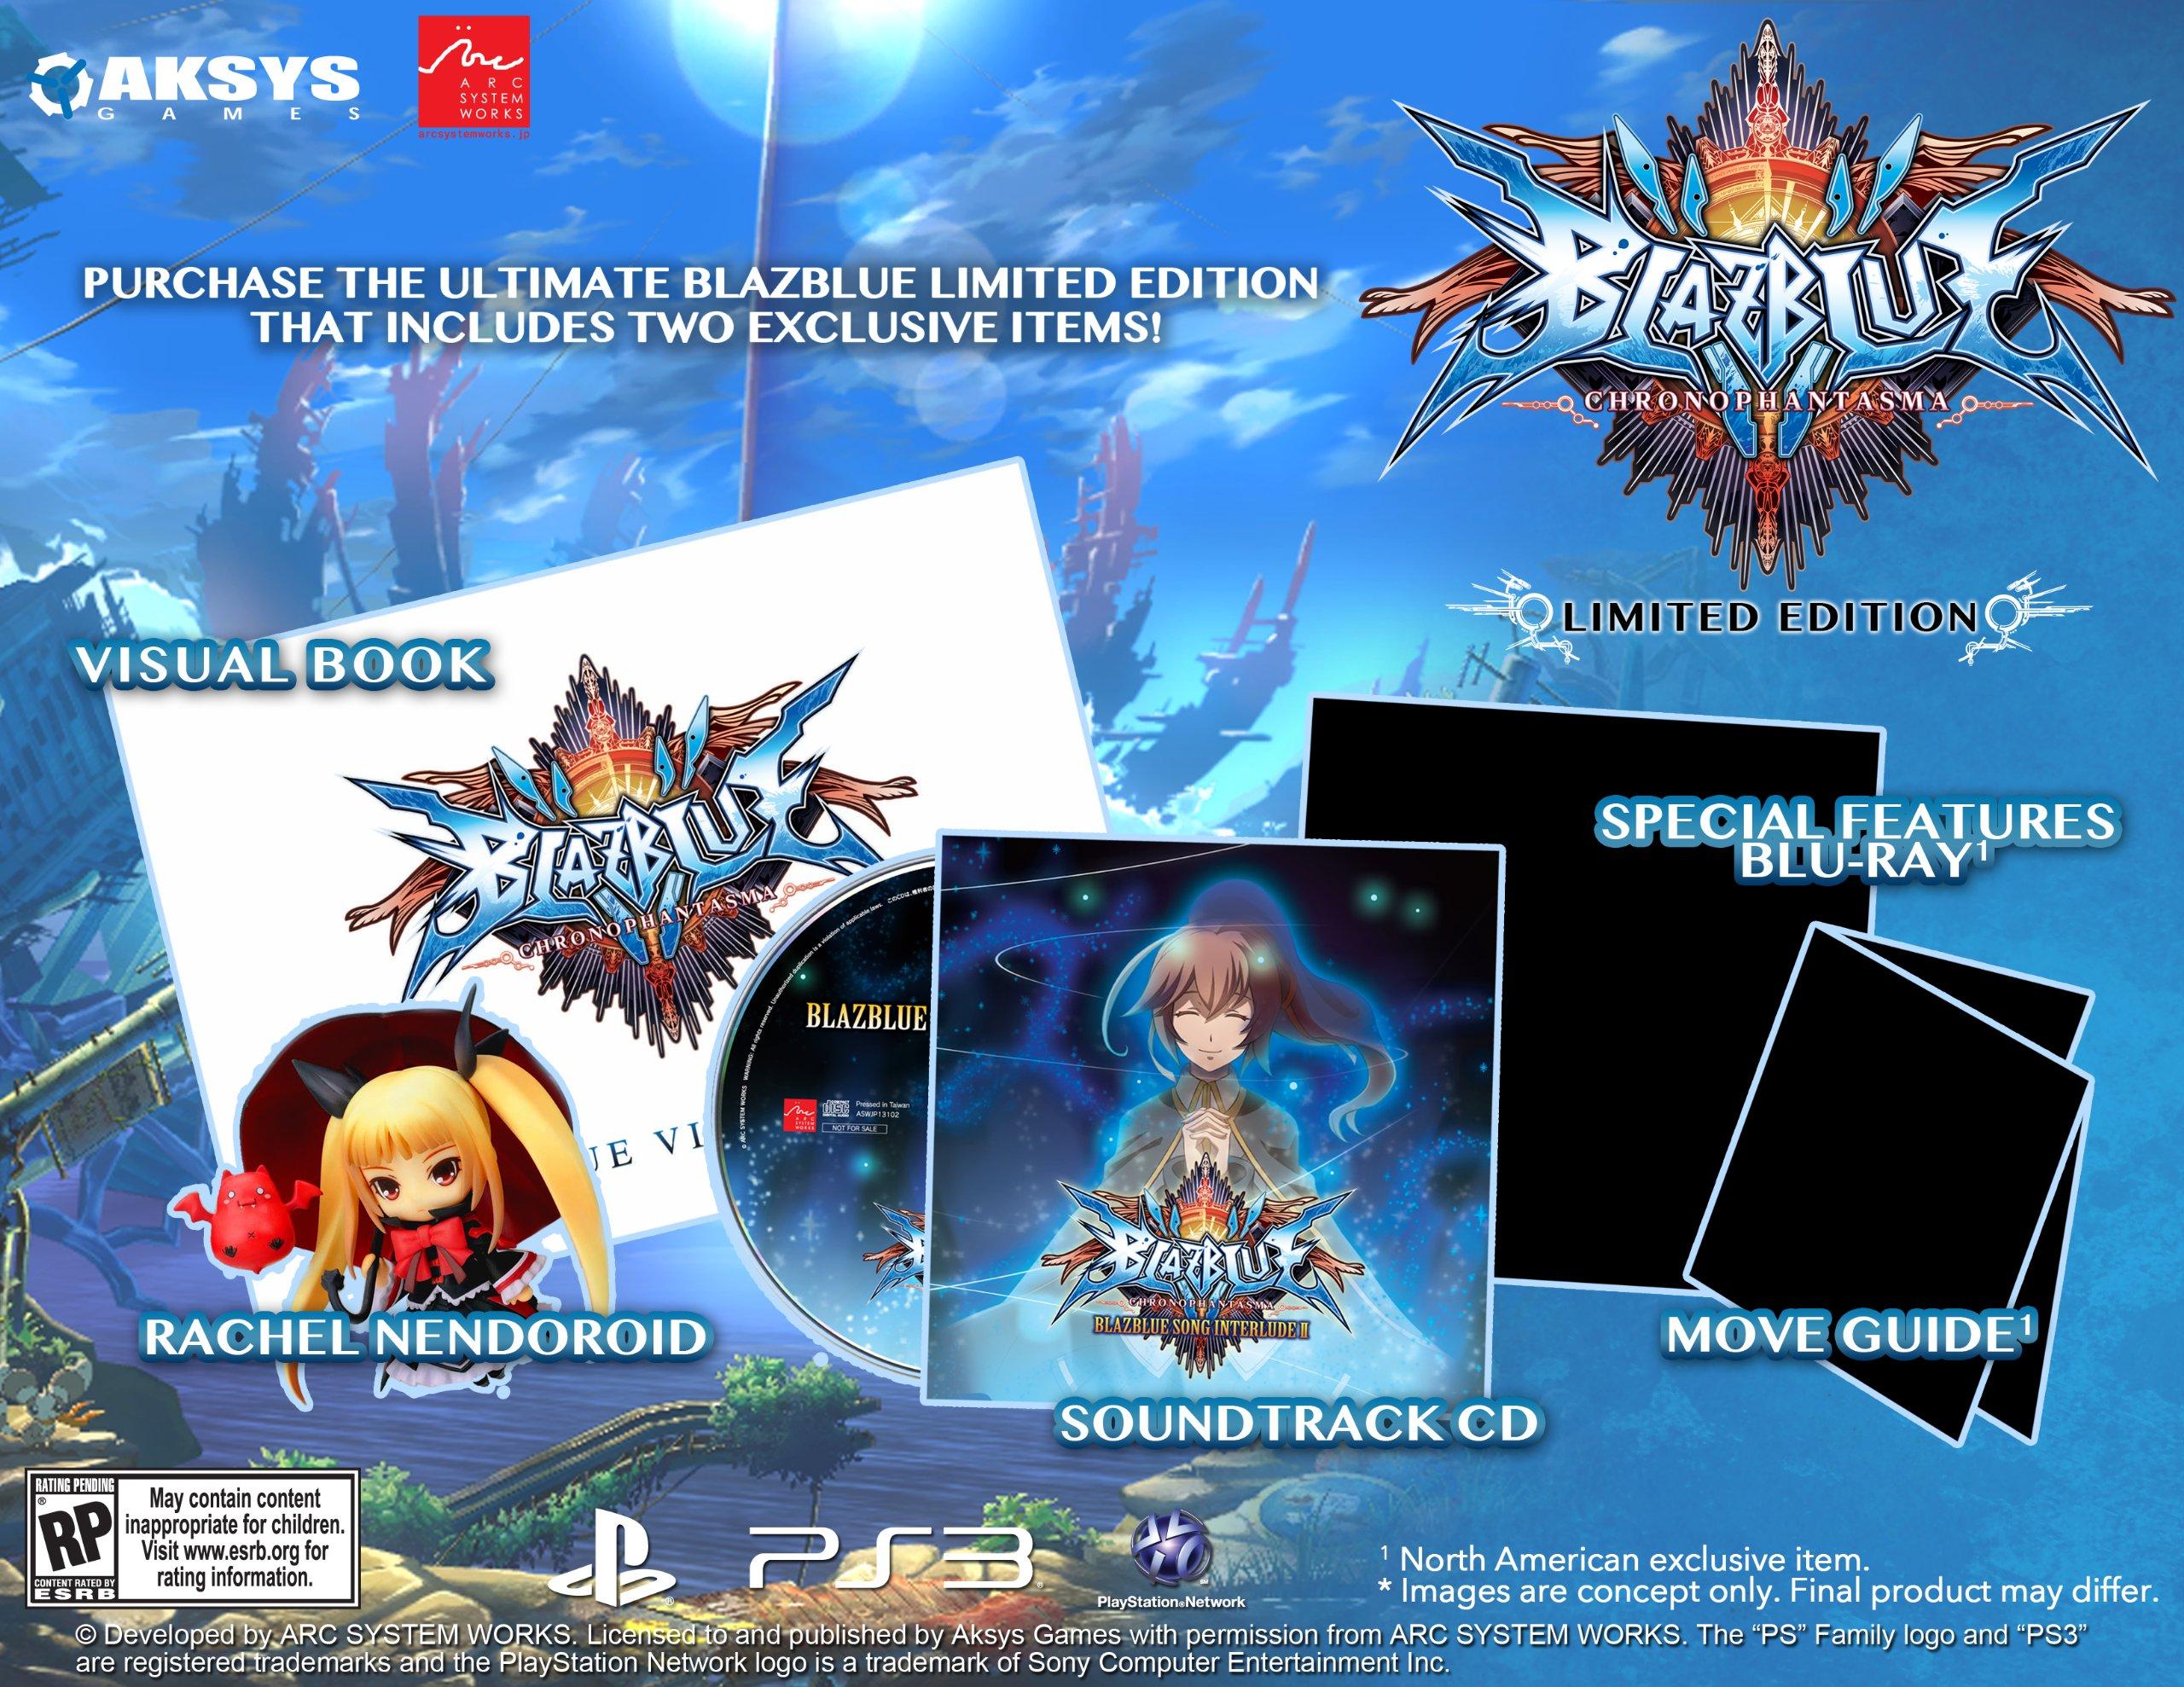 BlazBlue: Chrono Phantasma release date announced - Gematsu